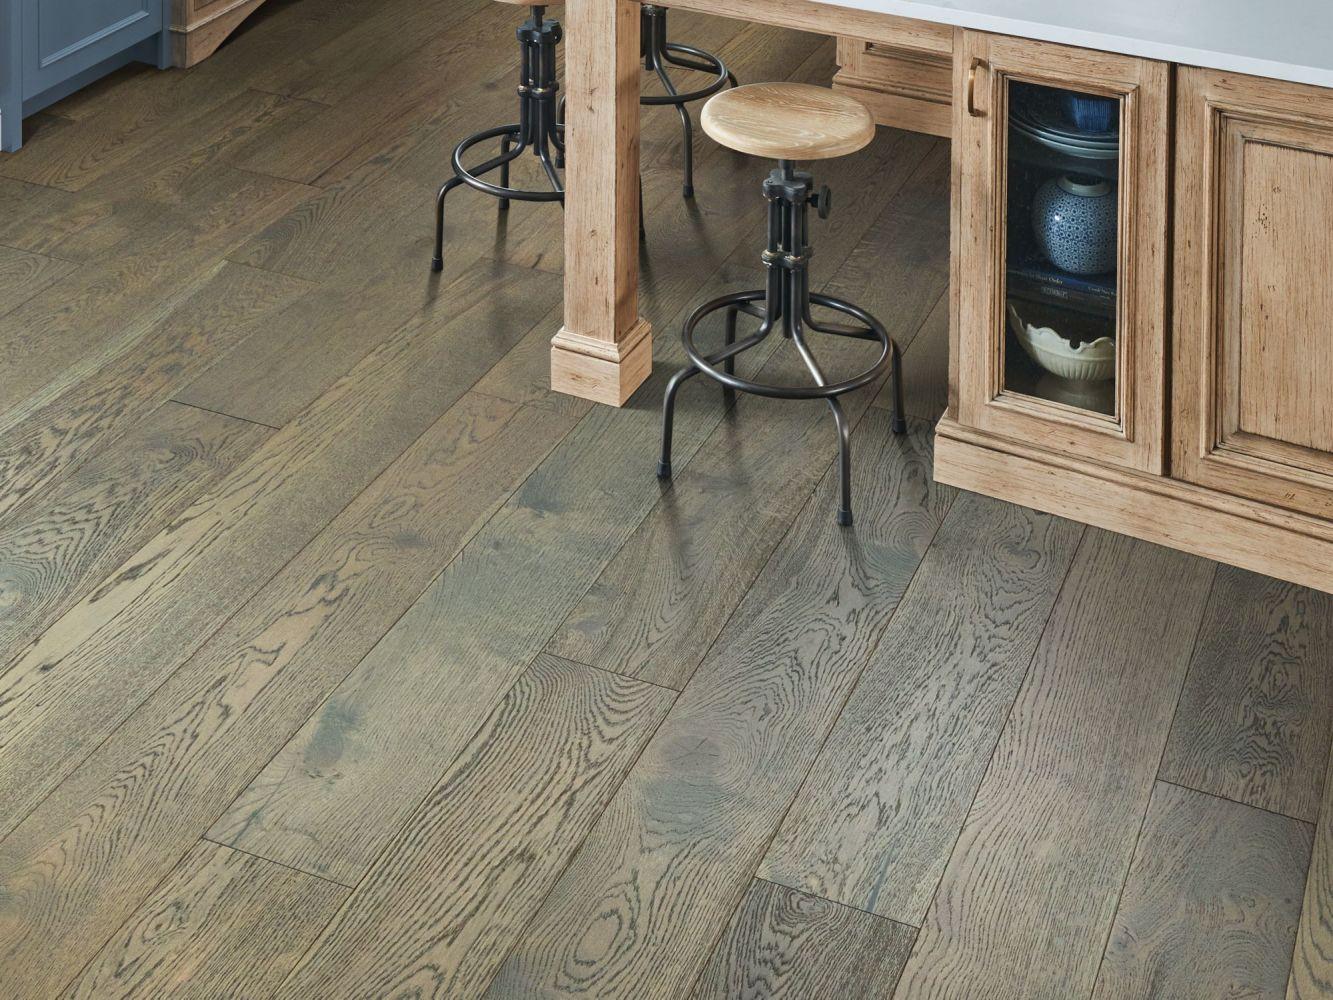 Shaw Floors Reality Homes Vogue Oak Praline 07038_208RH